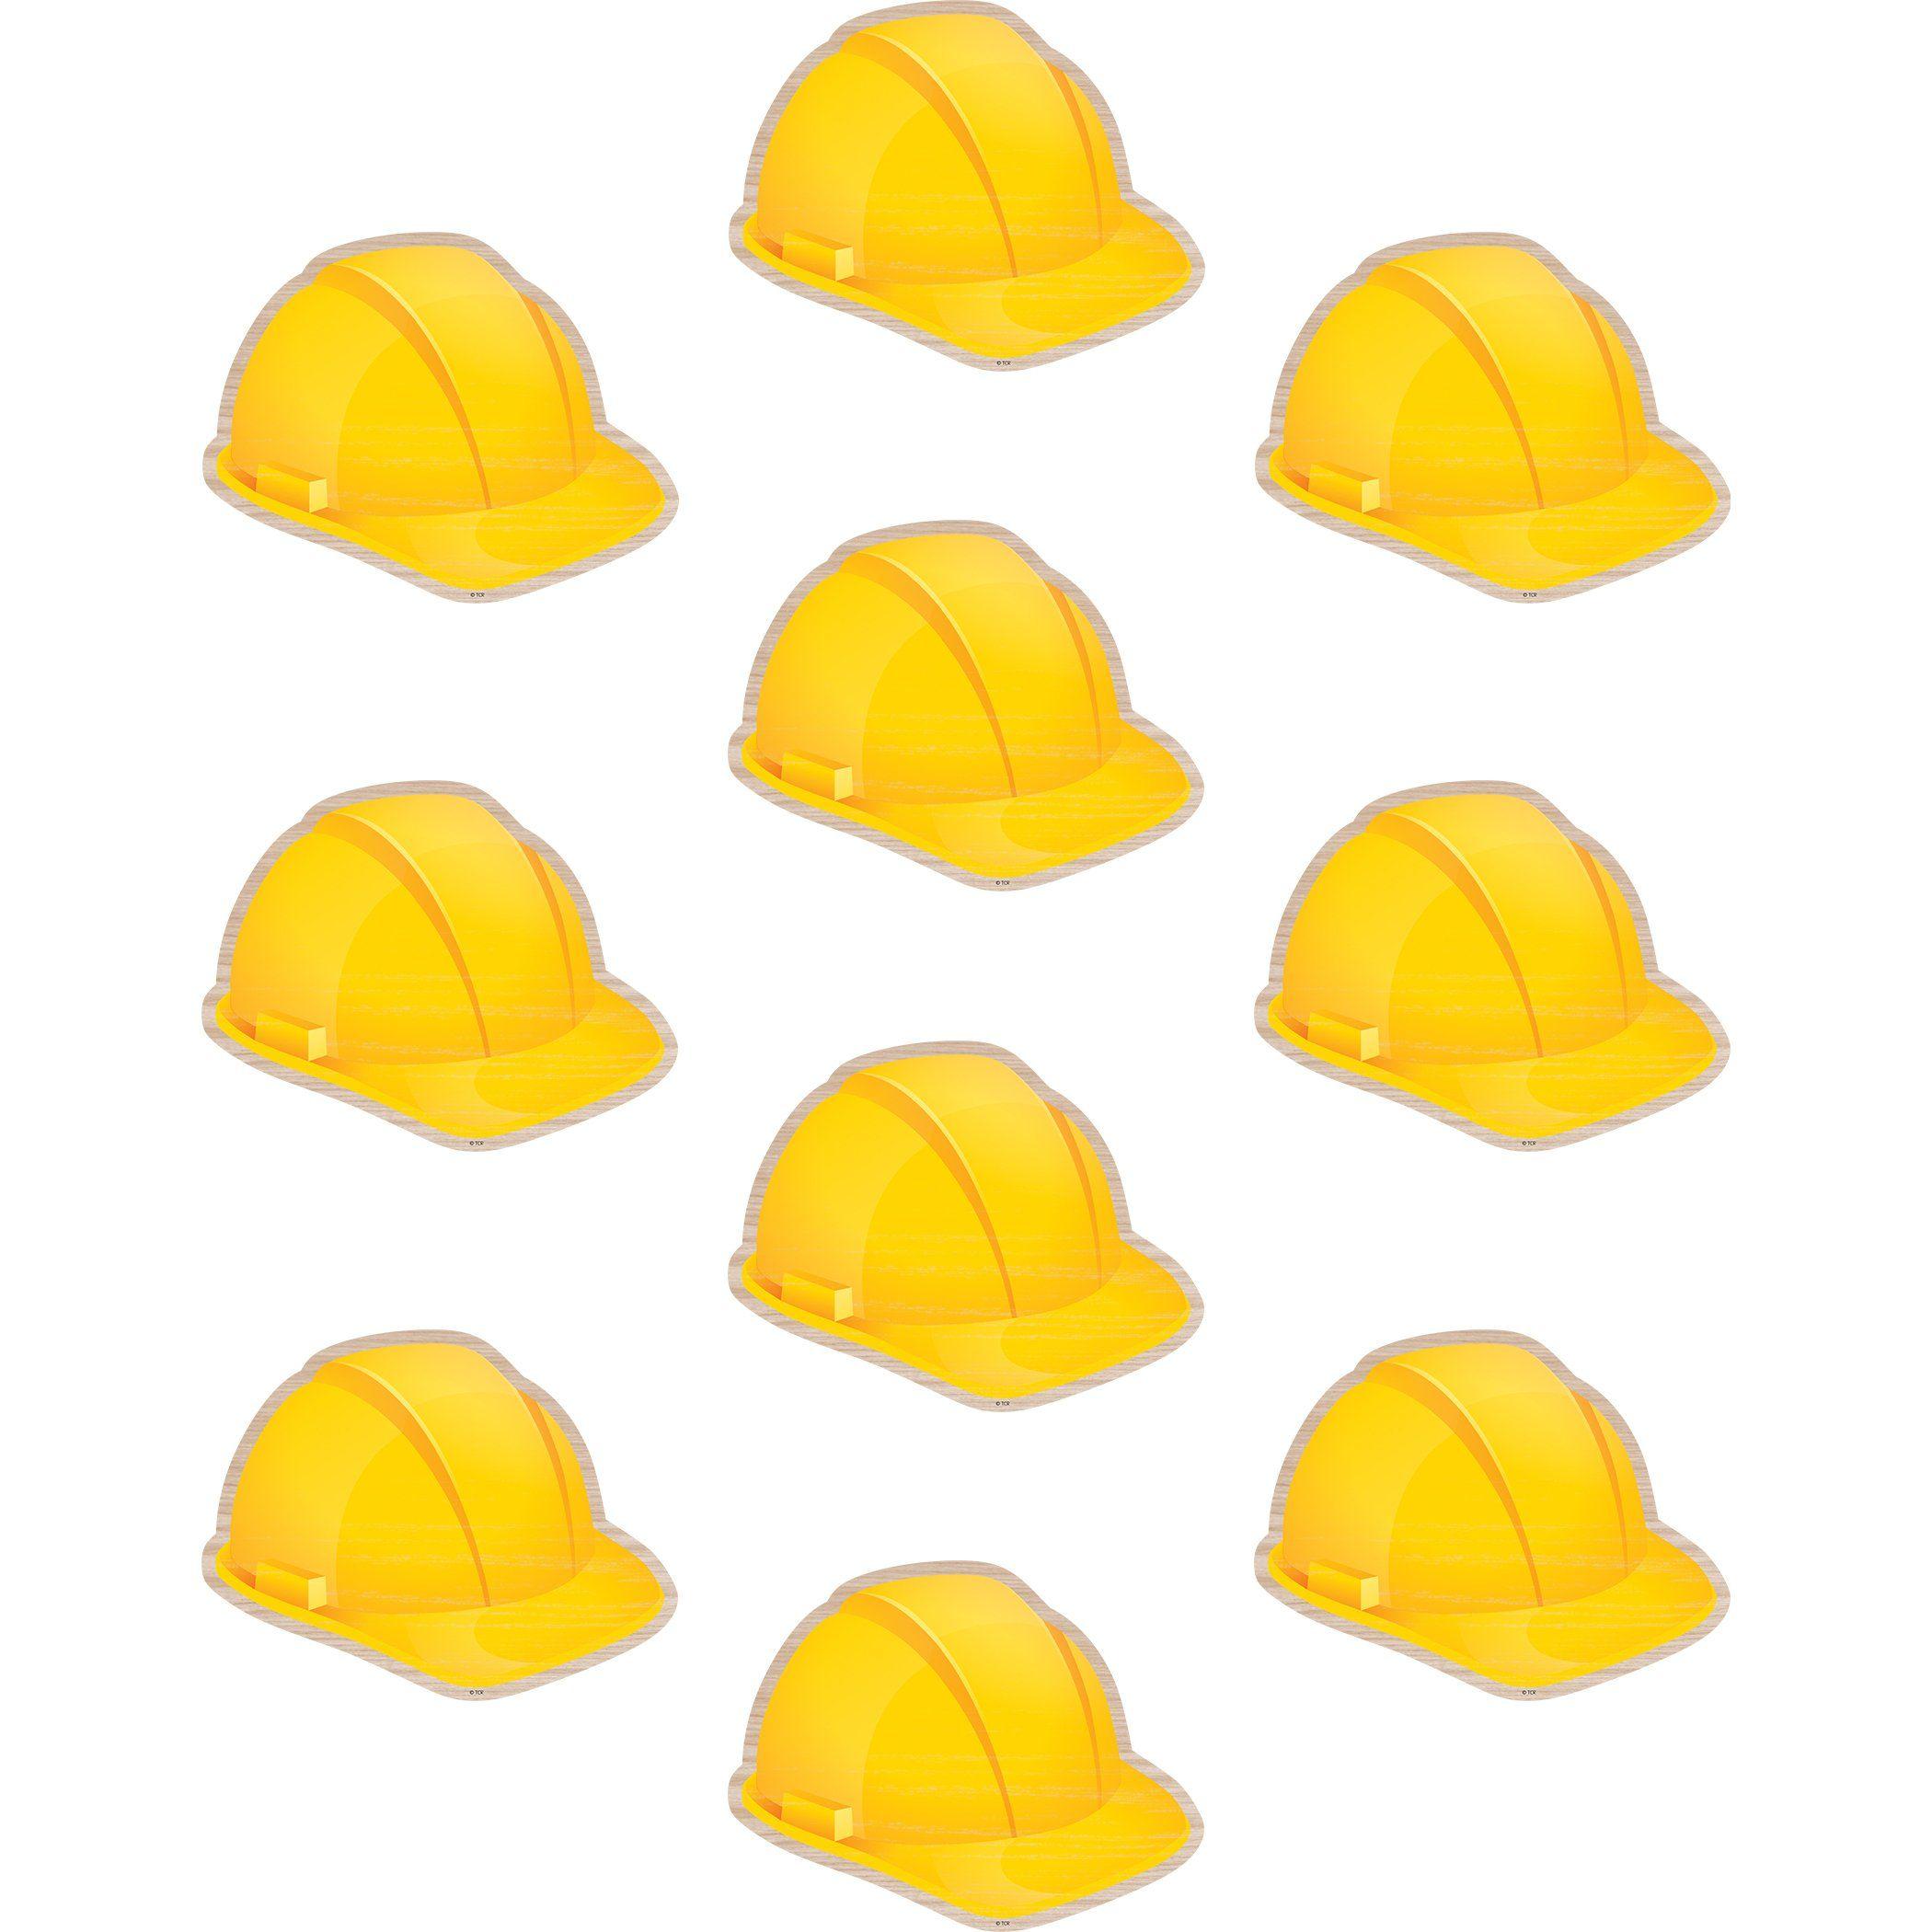 Construction Hard Hats Accents In 2021 Hard Hats Construction Theme Classroom Bulletin Board Decor